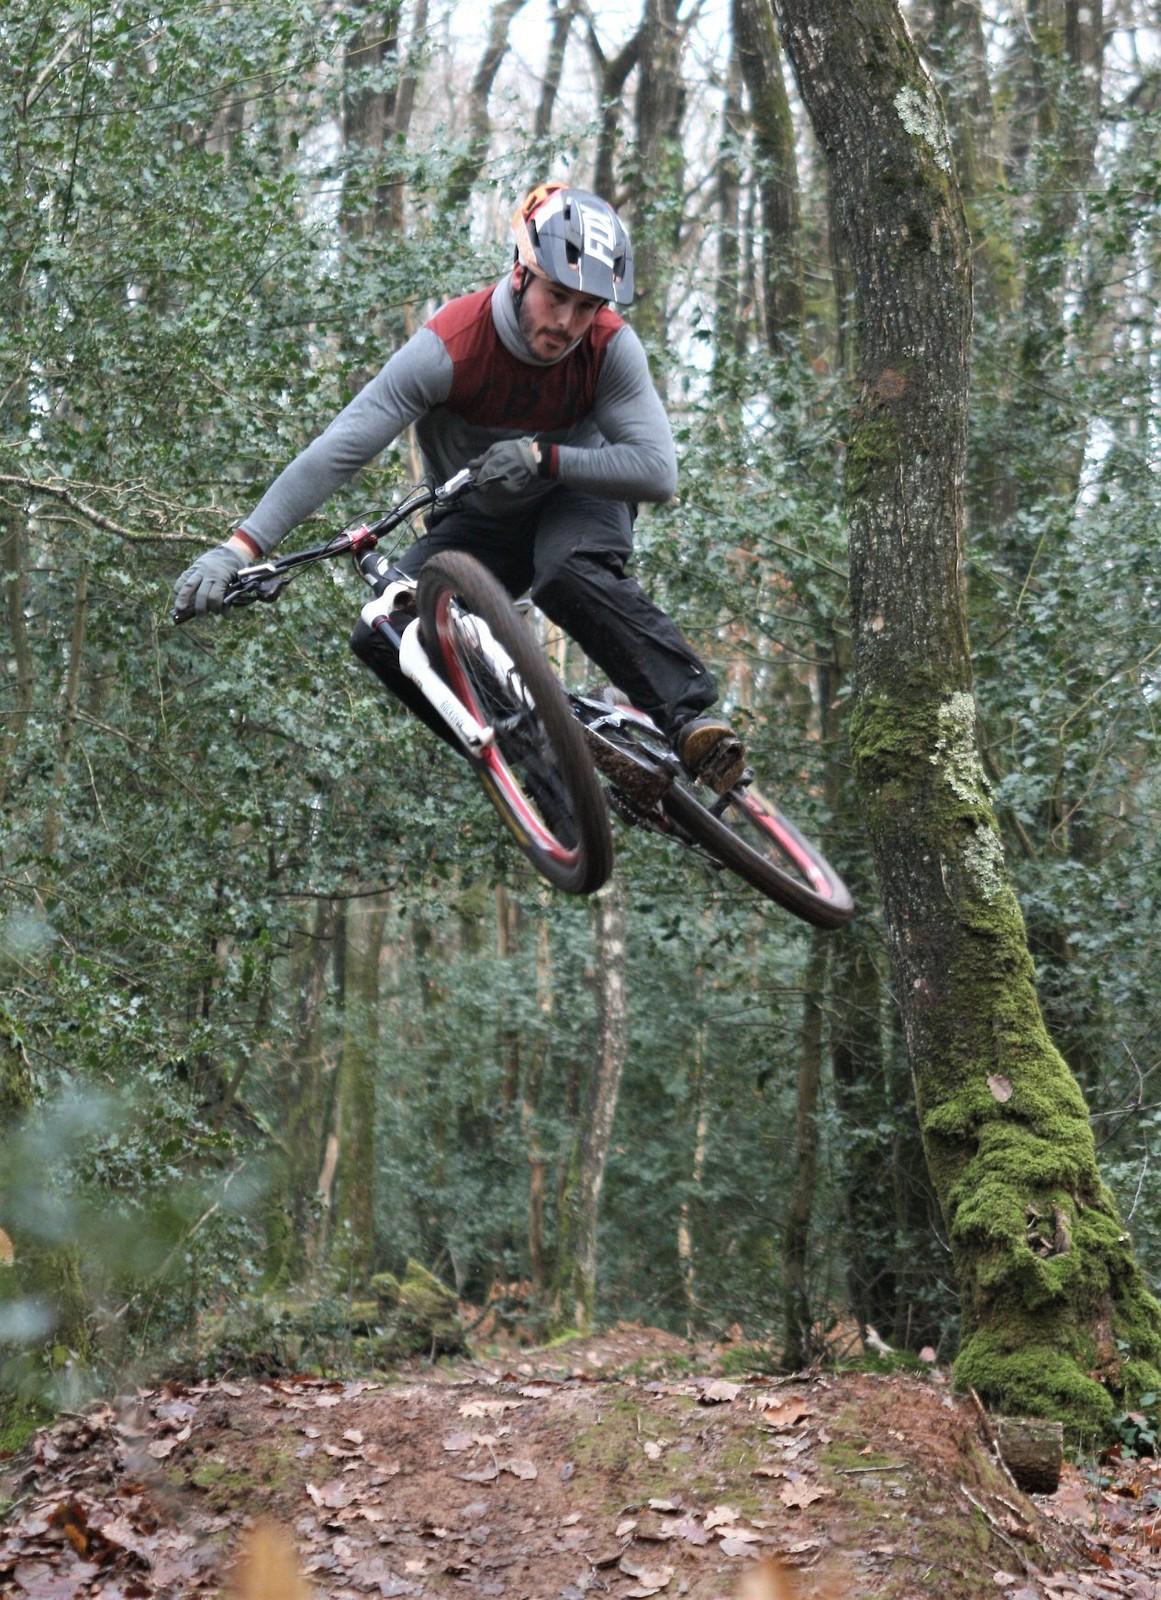 48367066 2895720810454264 2198178817736966144 o - creps - Mountain Biking Pictures - Vital MTB